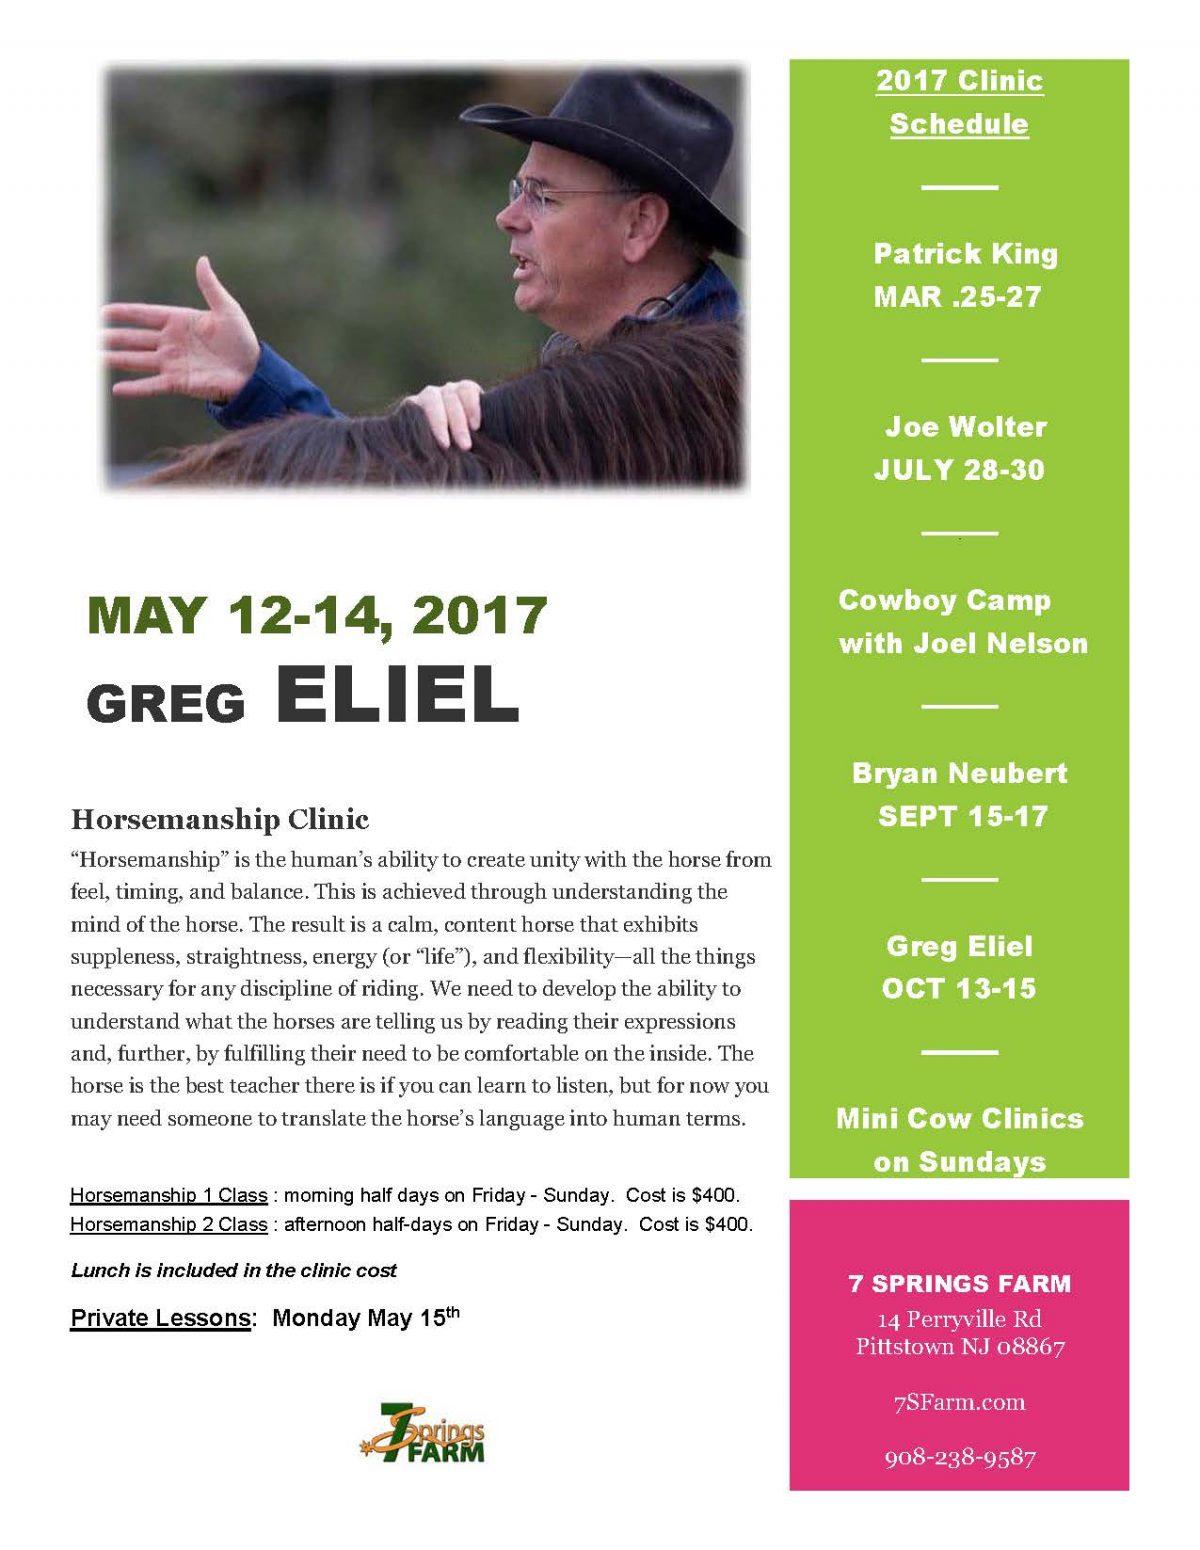 Greg Eliel Clinic Flyer 2017 (Revision 1)